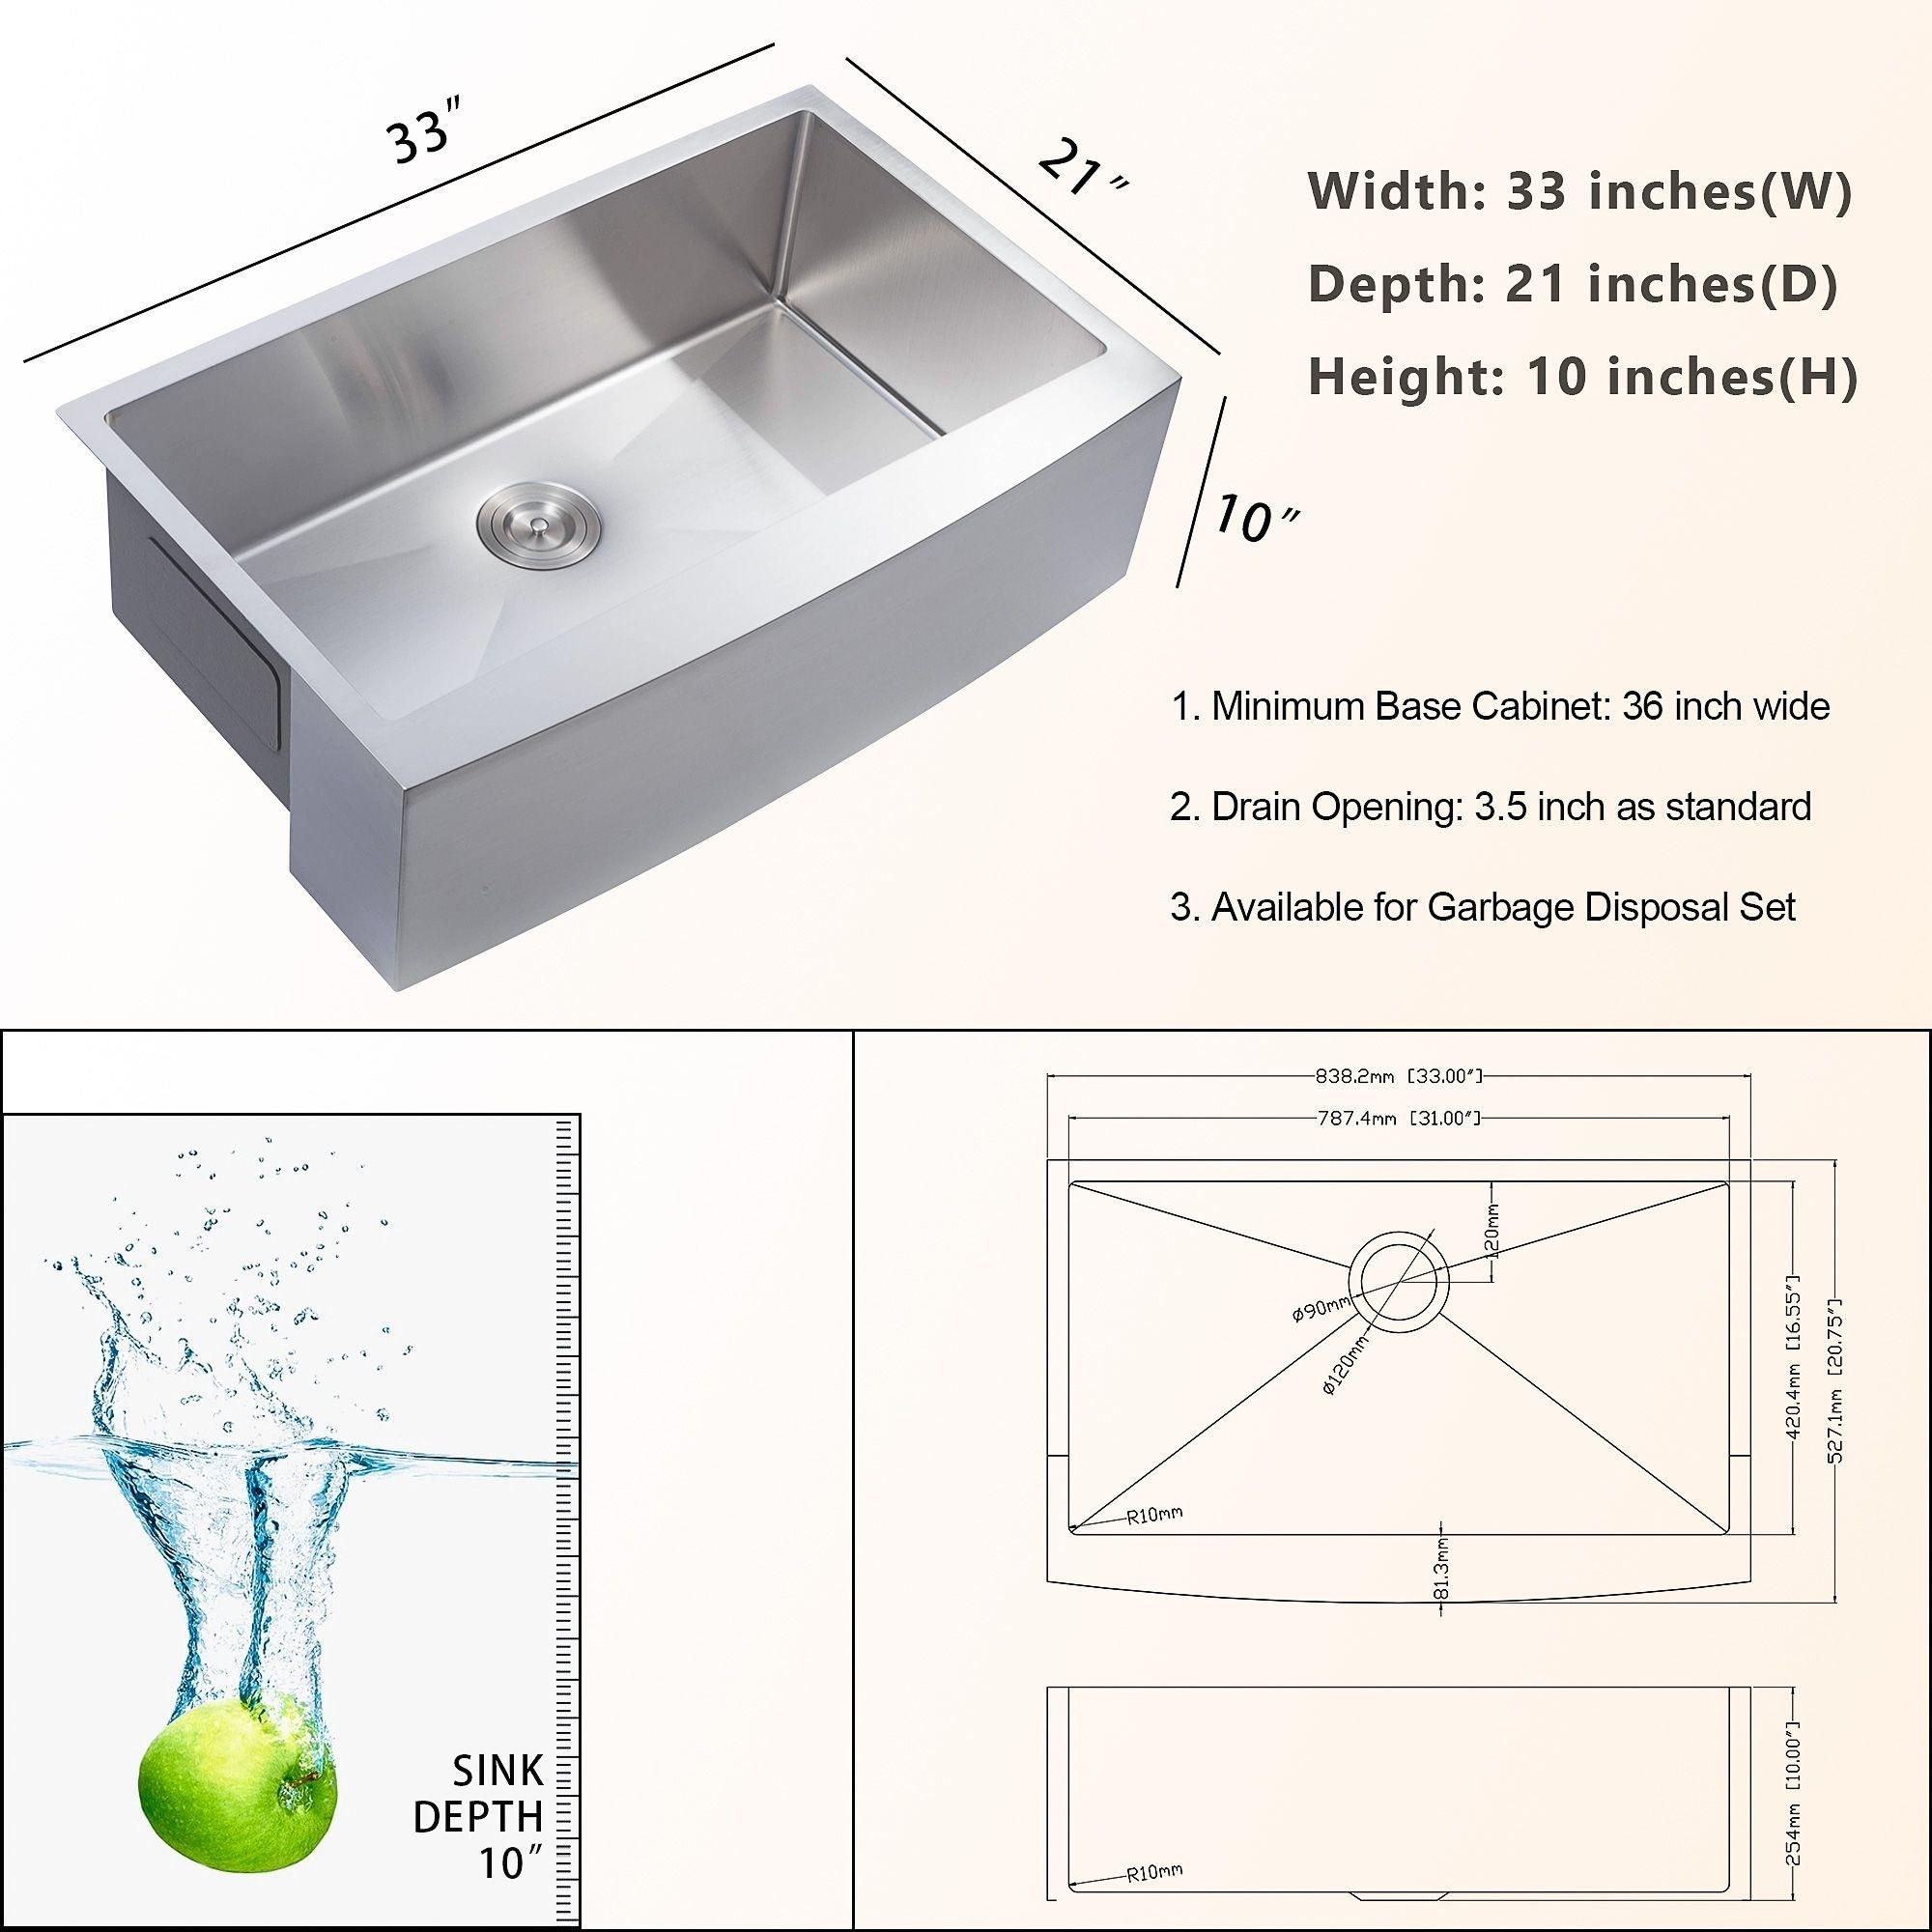 Lordear 33 Inch Farmhouse Kitchen Sink 16 Gauge Stainless Steel Apron Front Single Bowl Farm Kitchen Sink On Sale Overstock 31706142 30 X 21 X 10 Silver